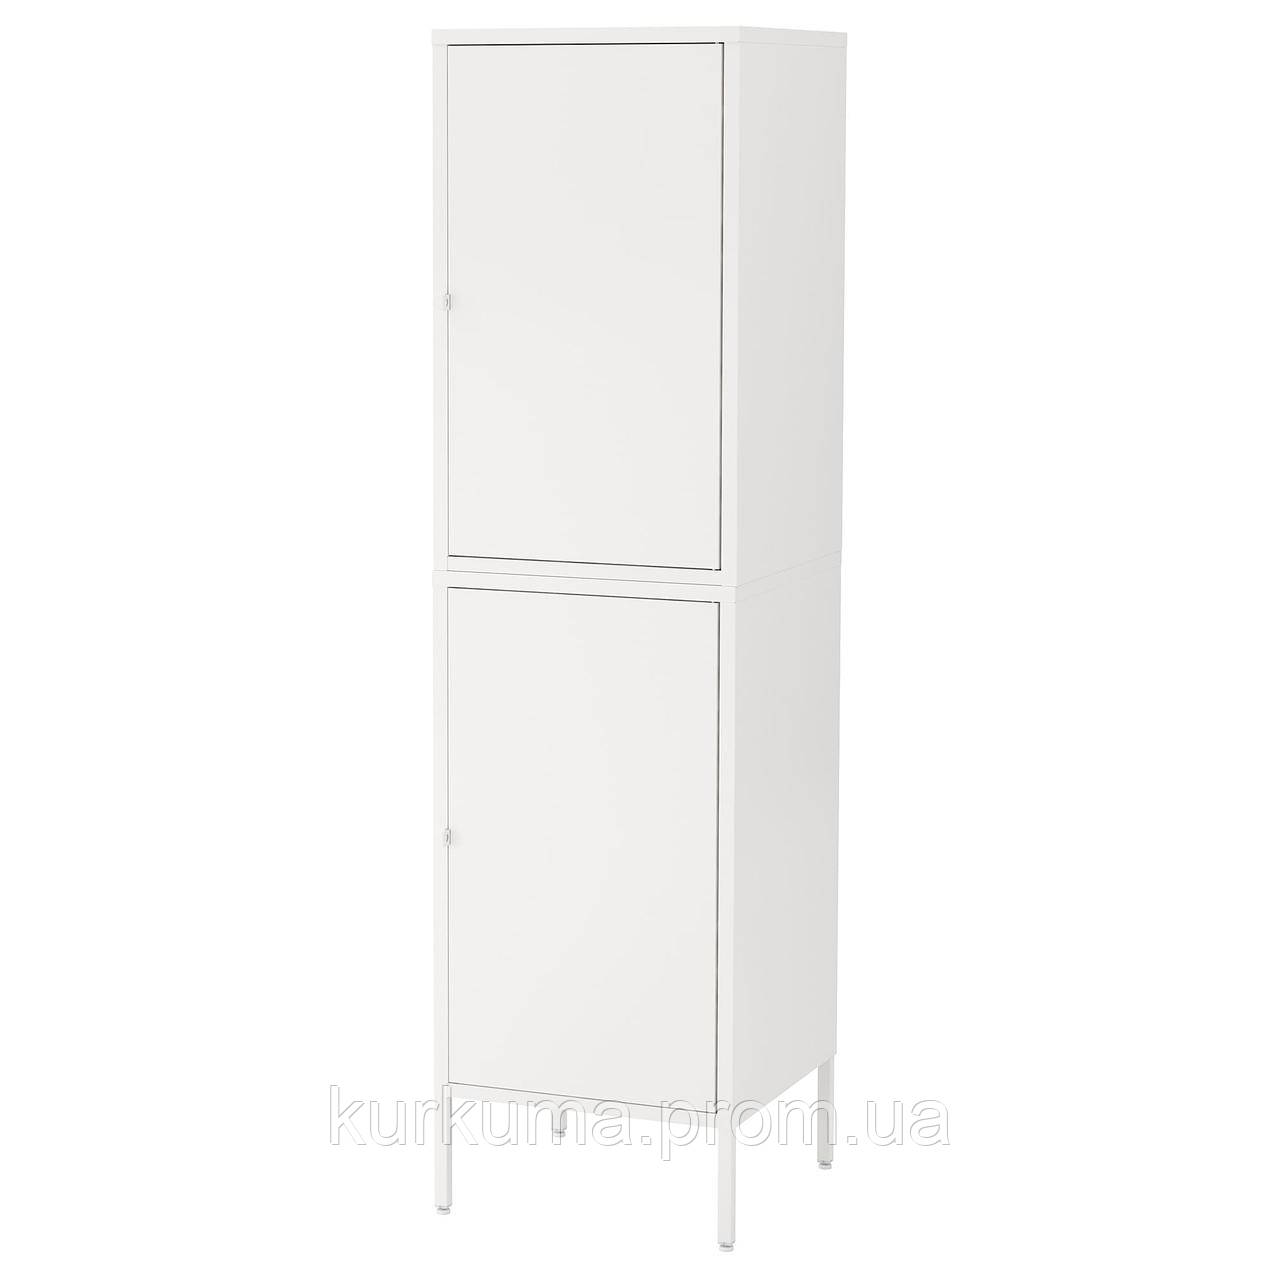 IKEA HALLAN Шкаф с дверями, белый  (892.494.03)